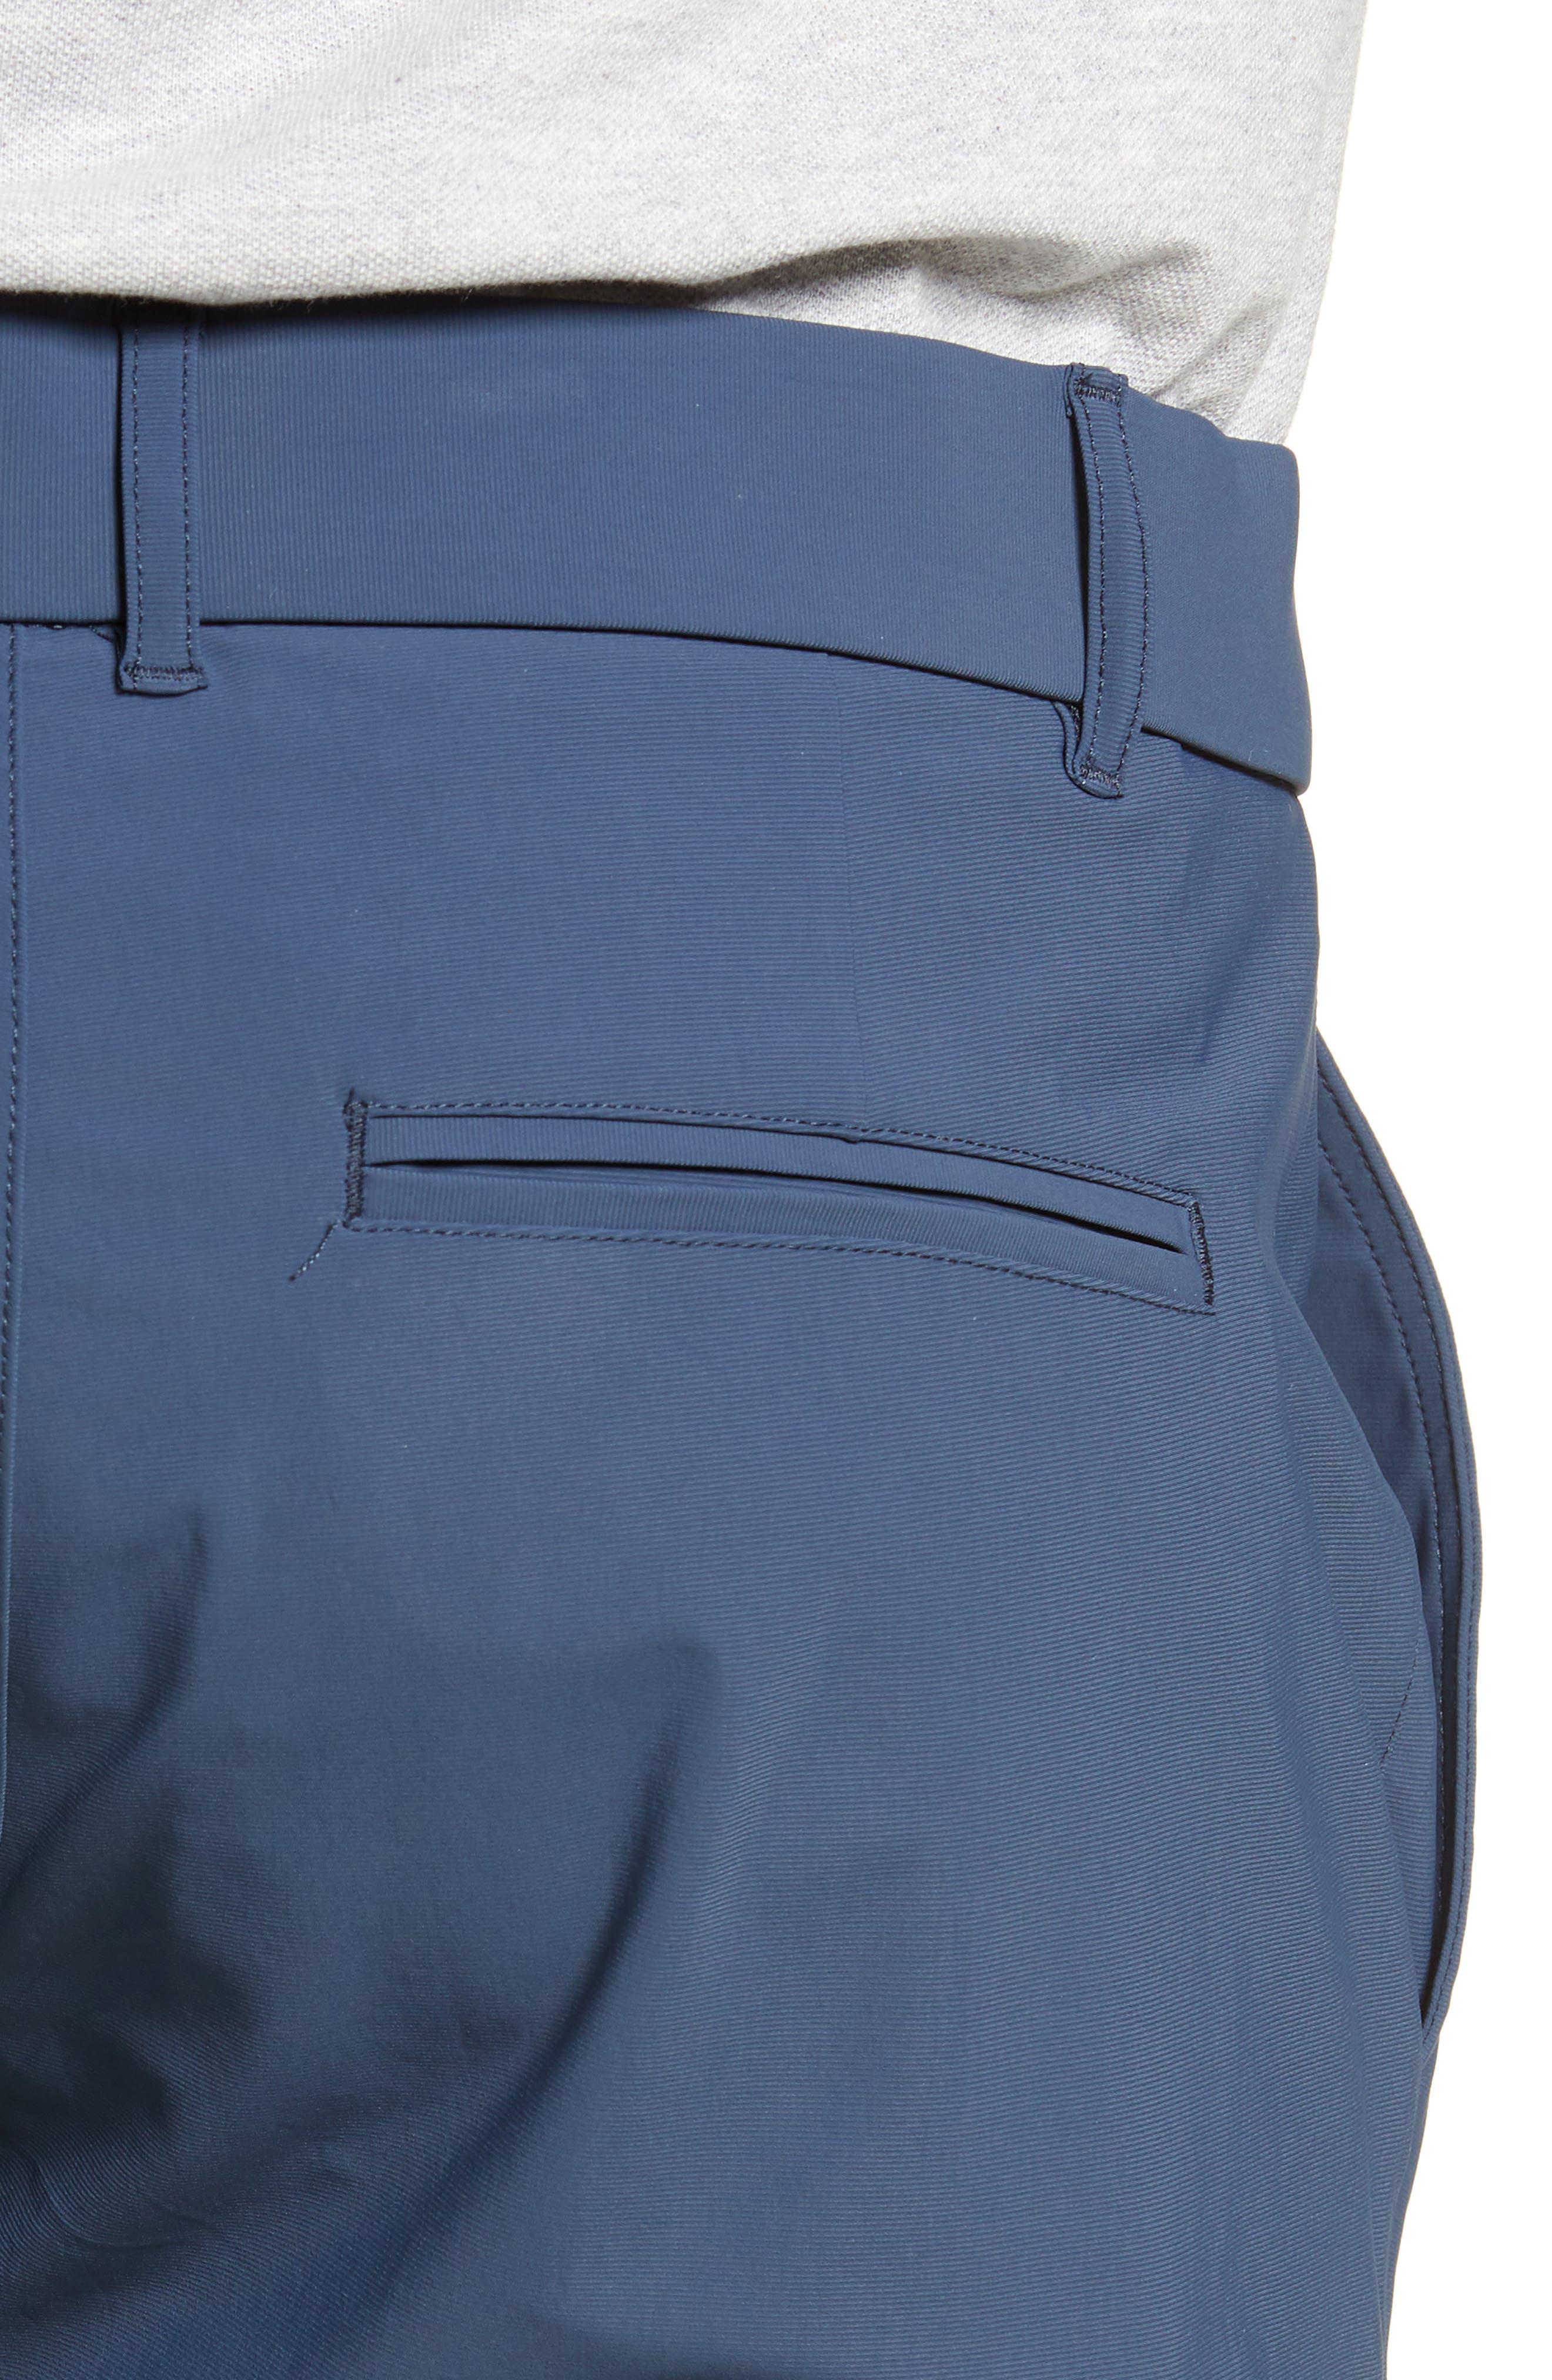 GREYSON, Montauk Technical Shorts, Alternate thumbnail 5, color, EEL